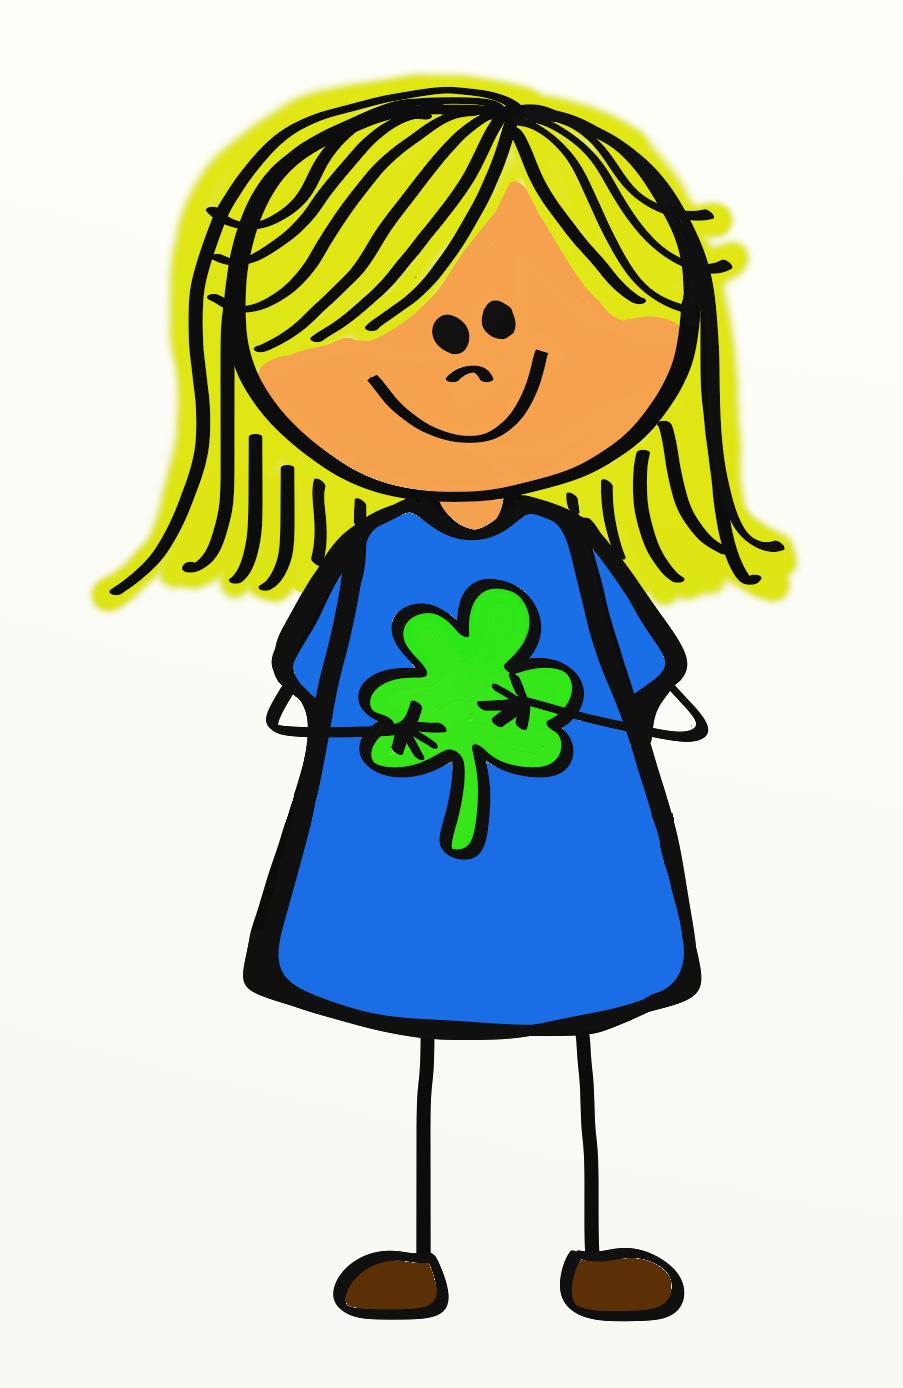 Preschool Clipart Images   Free Download Best Preschool Clipart - Free Printable Preschool Clip Art